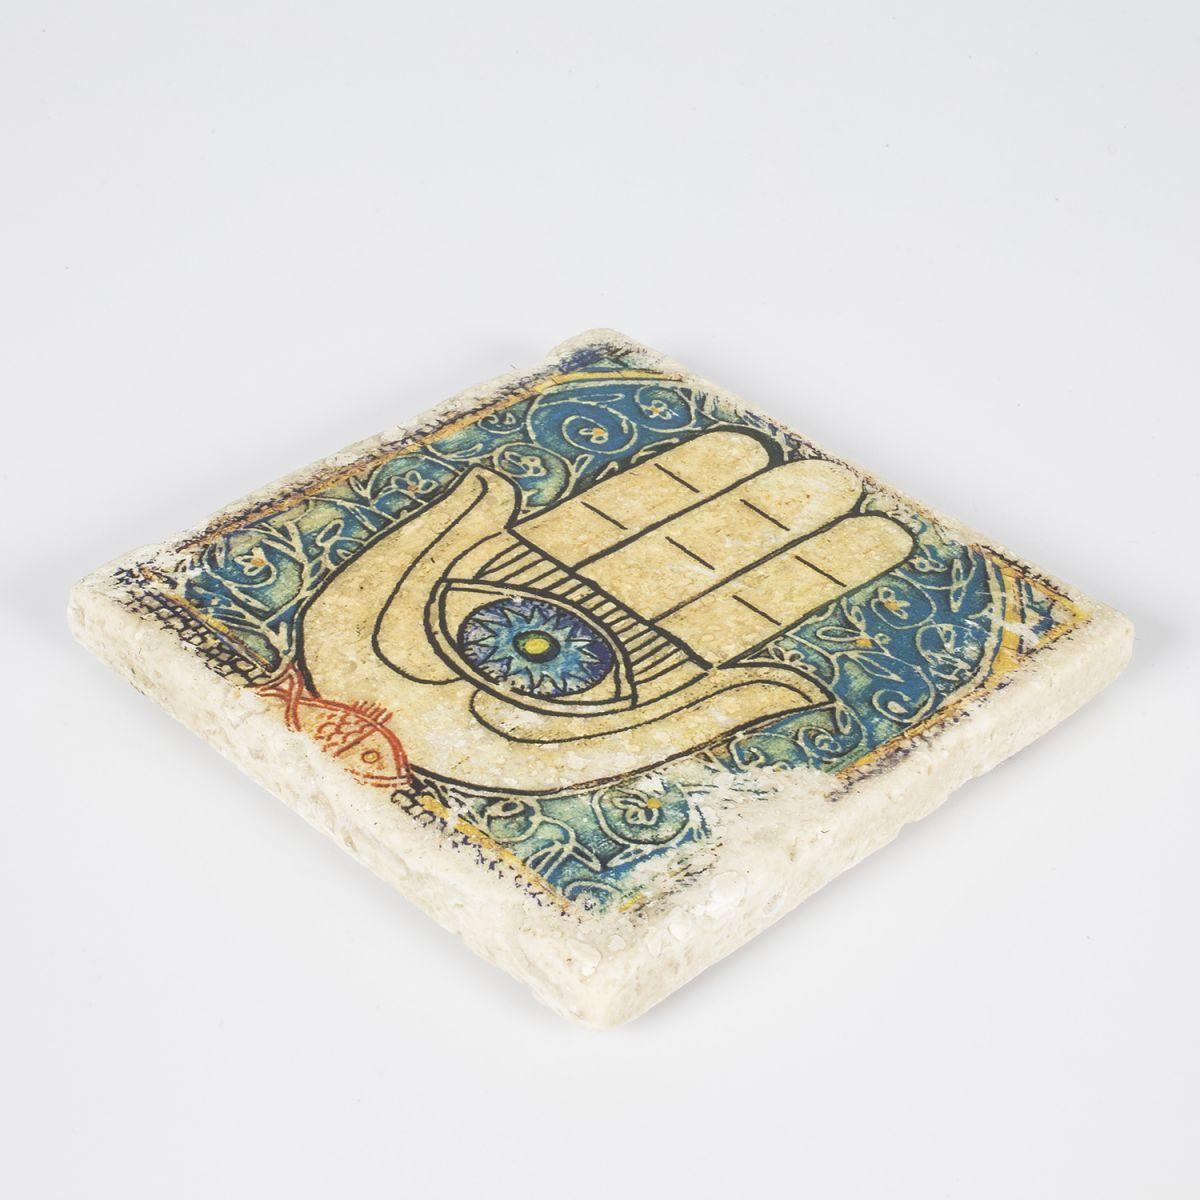 Coaster Travertine - Hand Of Fatima / Colorful 2 (10x10)